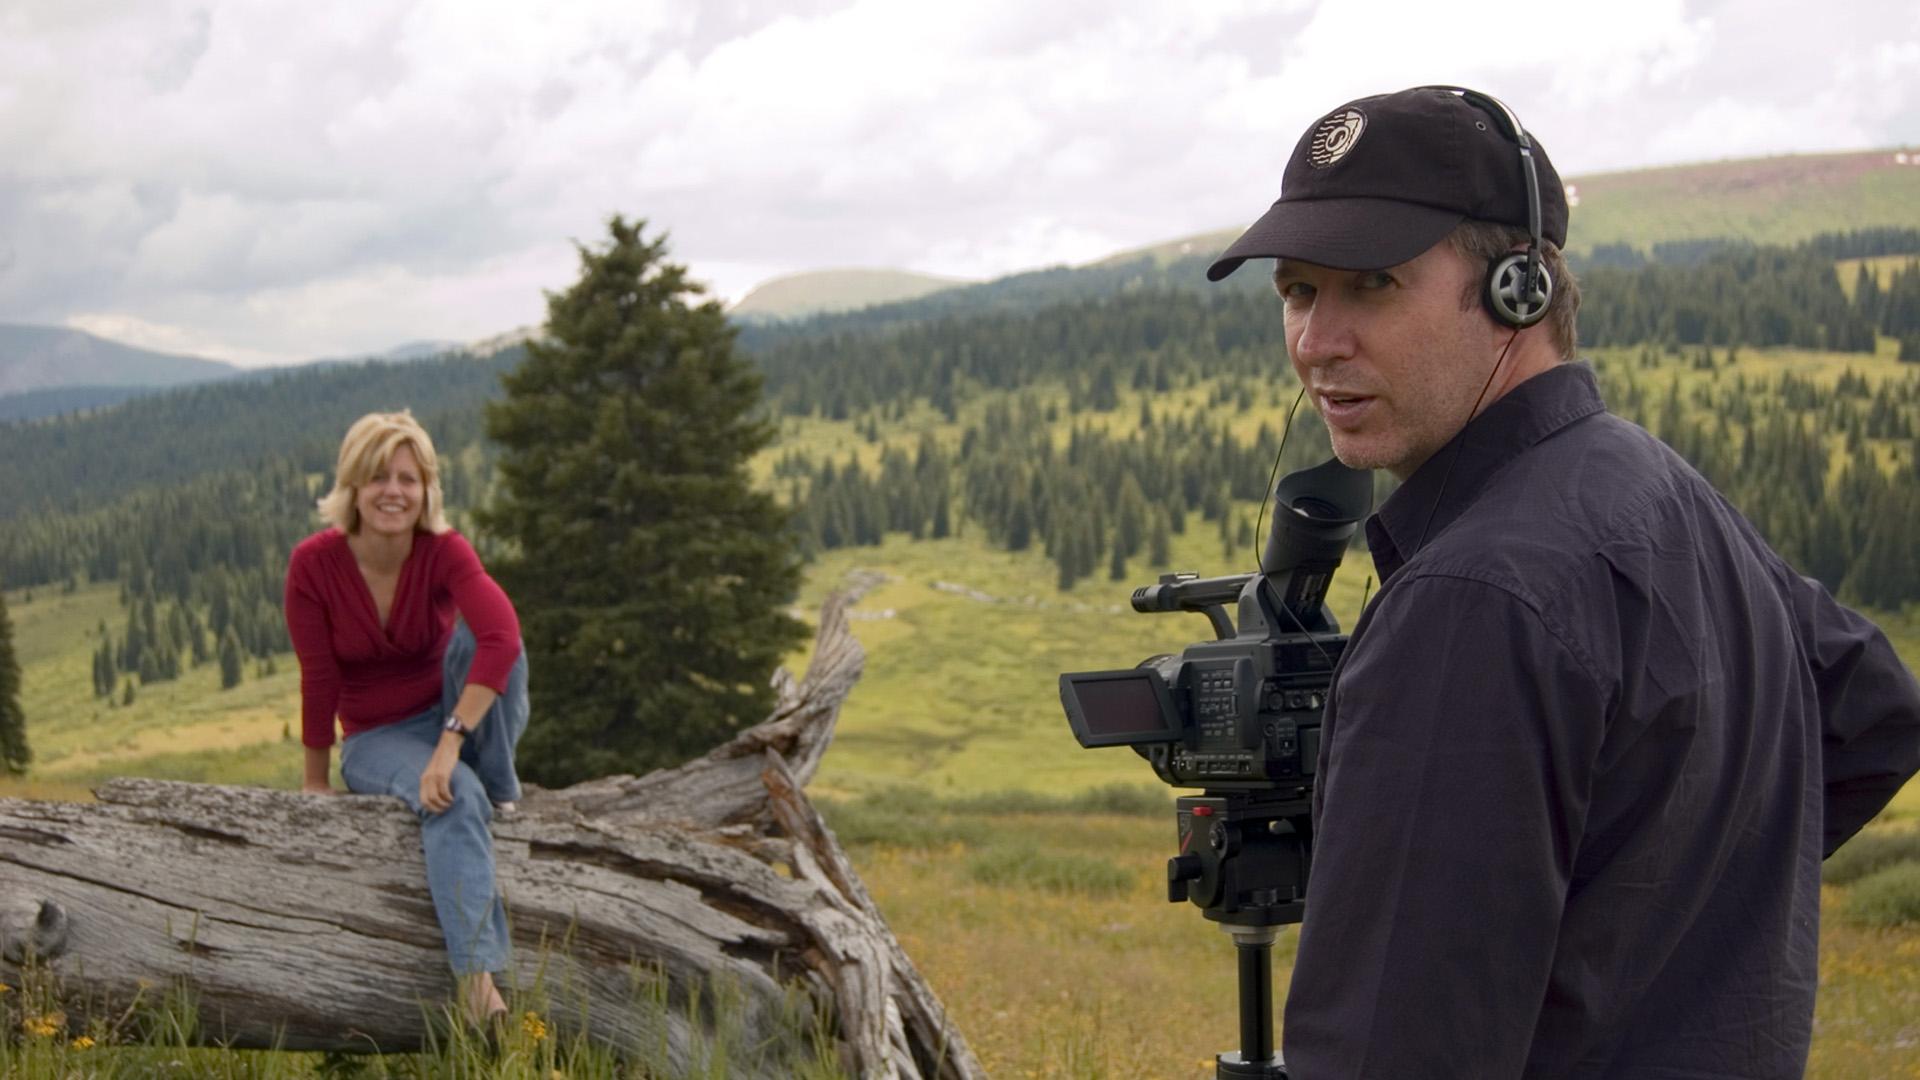 PJ Letofsky and Polly Letofsky on Vail Mountain, Colorado